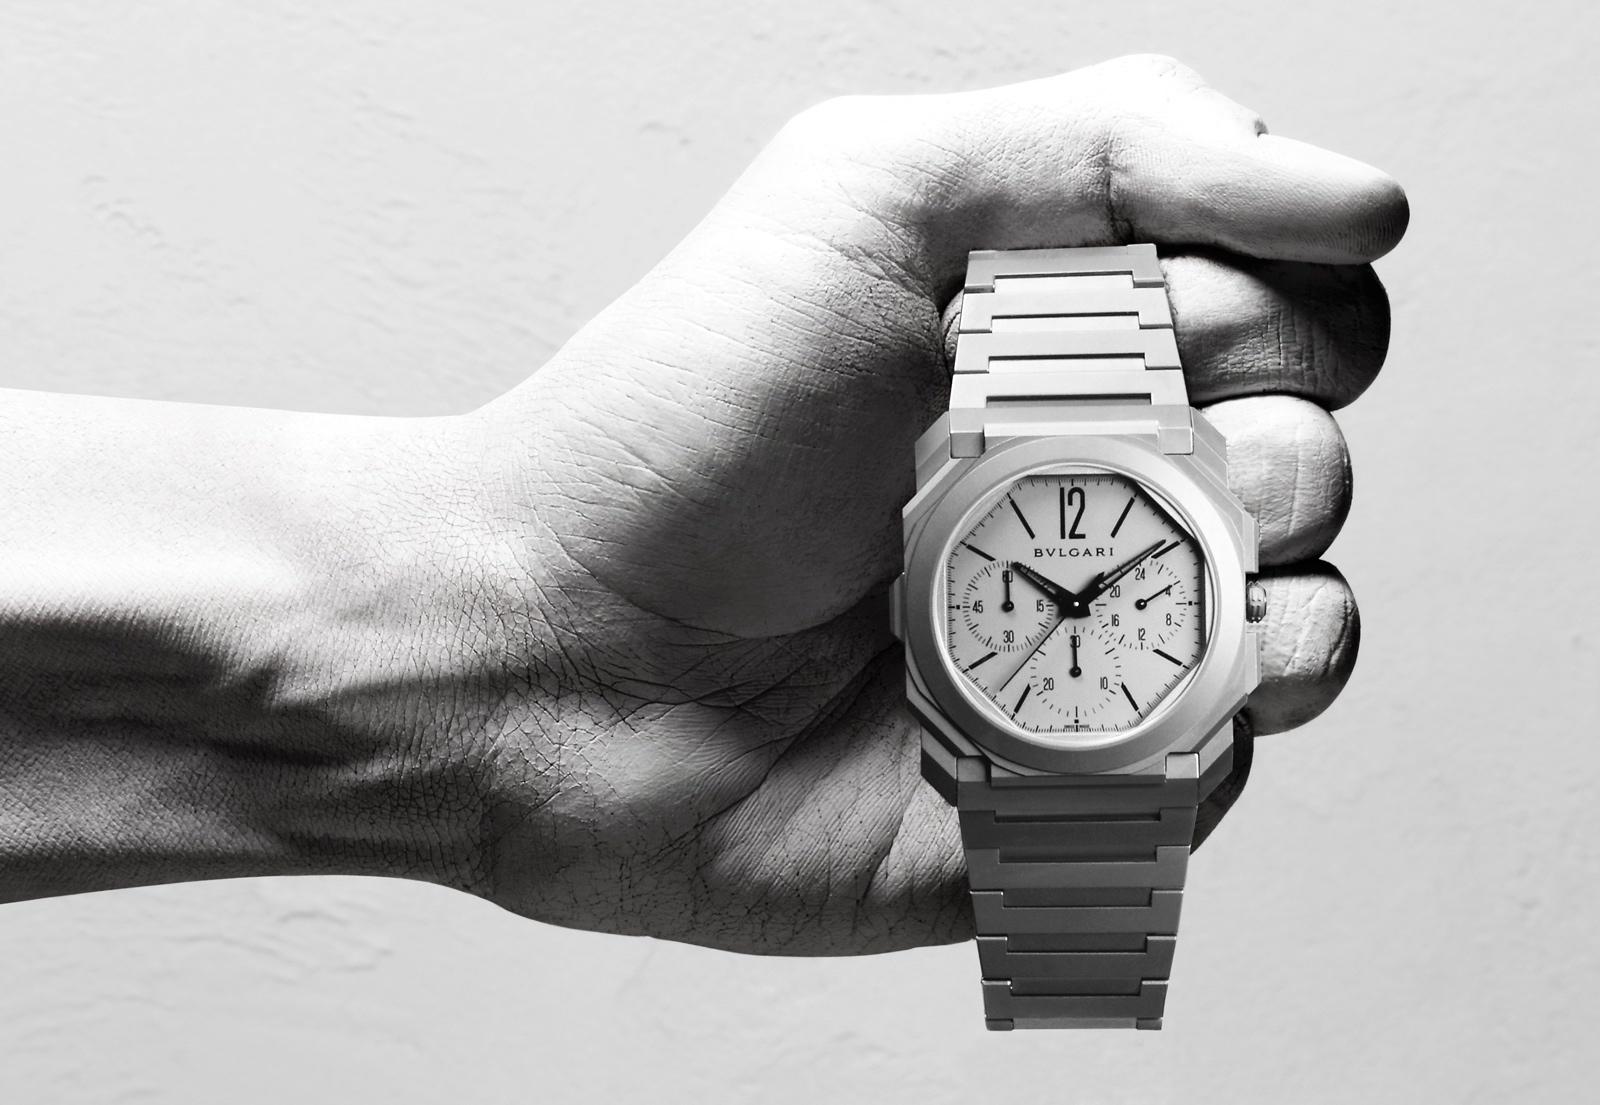 Bulgari en Baselworld 2019 - Octo Finissimo Chronograph GMT